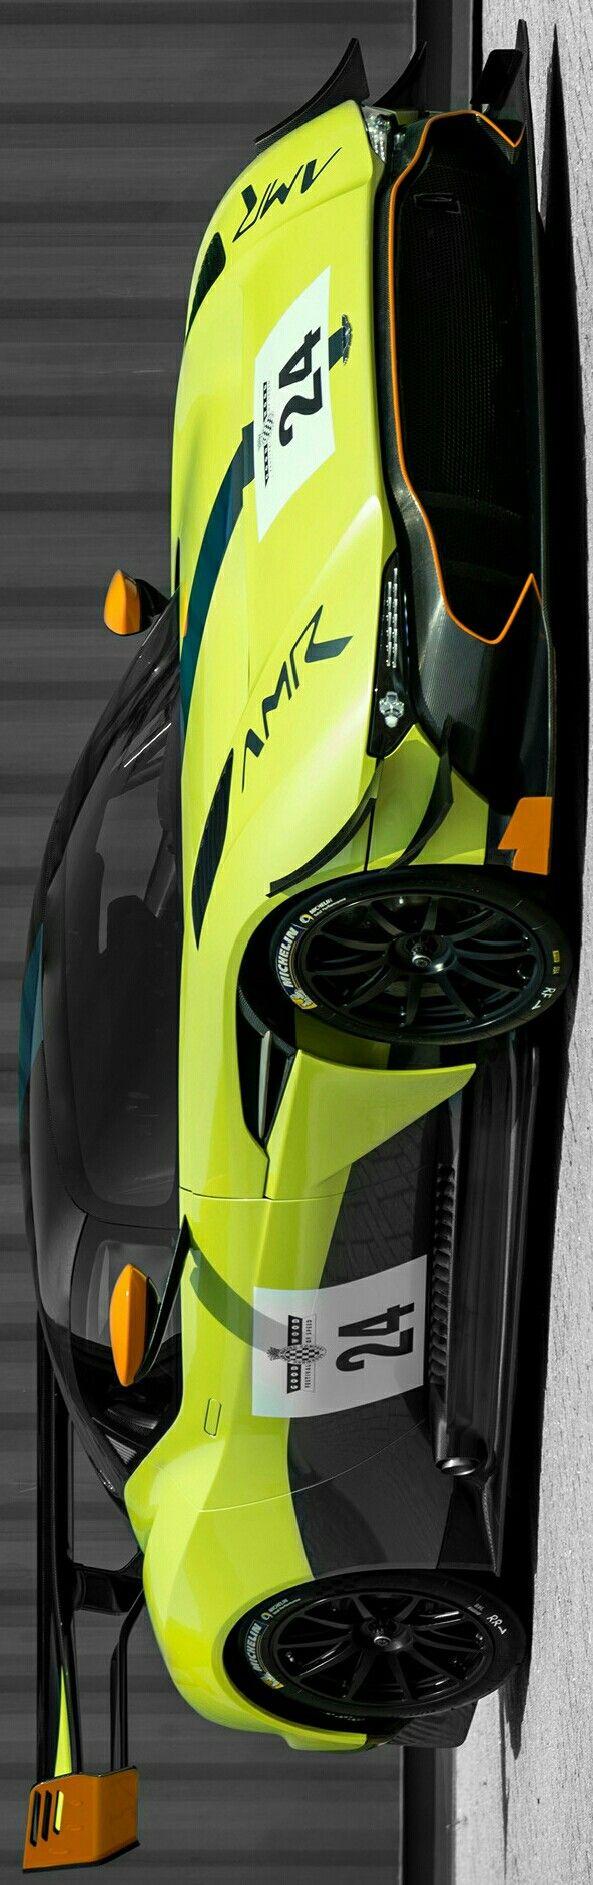 2017 Aston Martin Vulcan AMR Pro by Levon